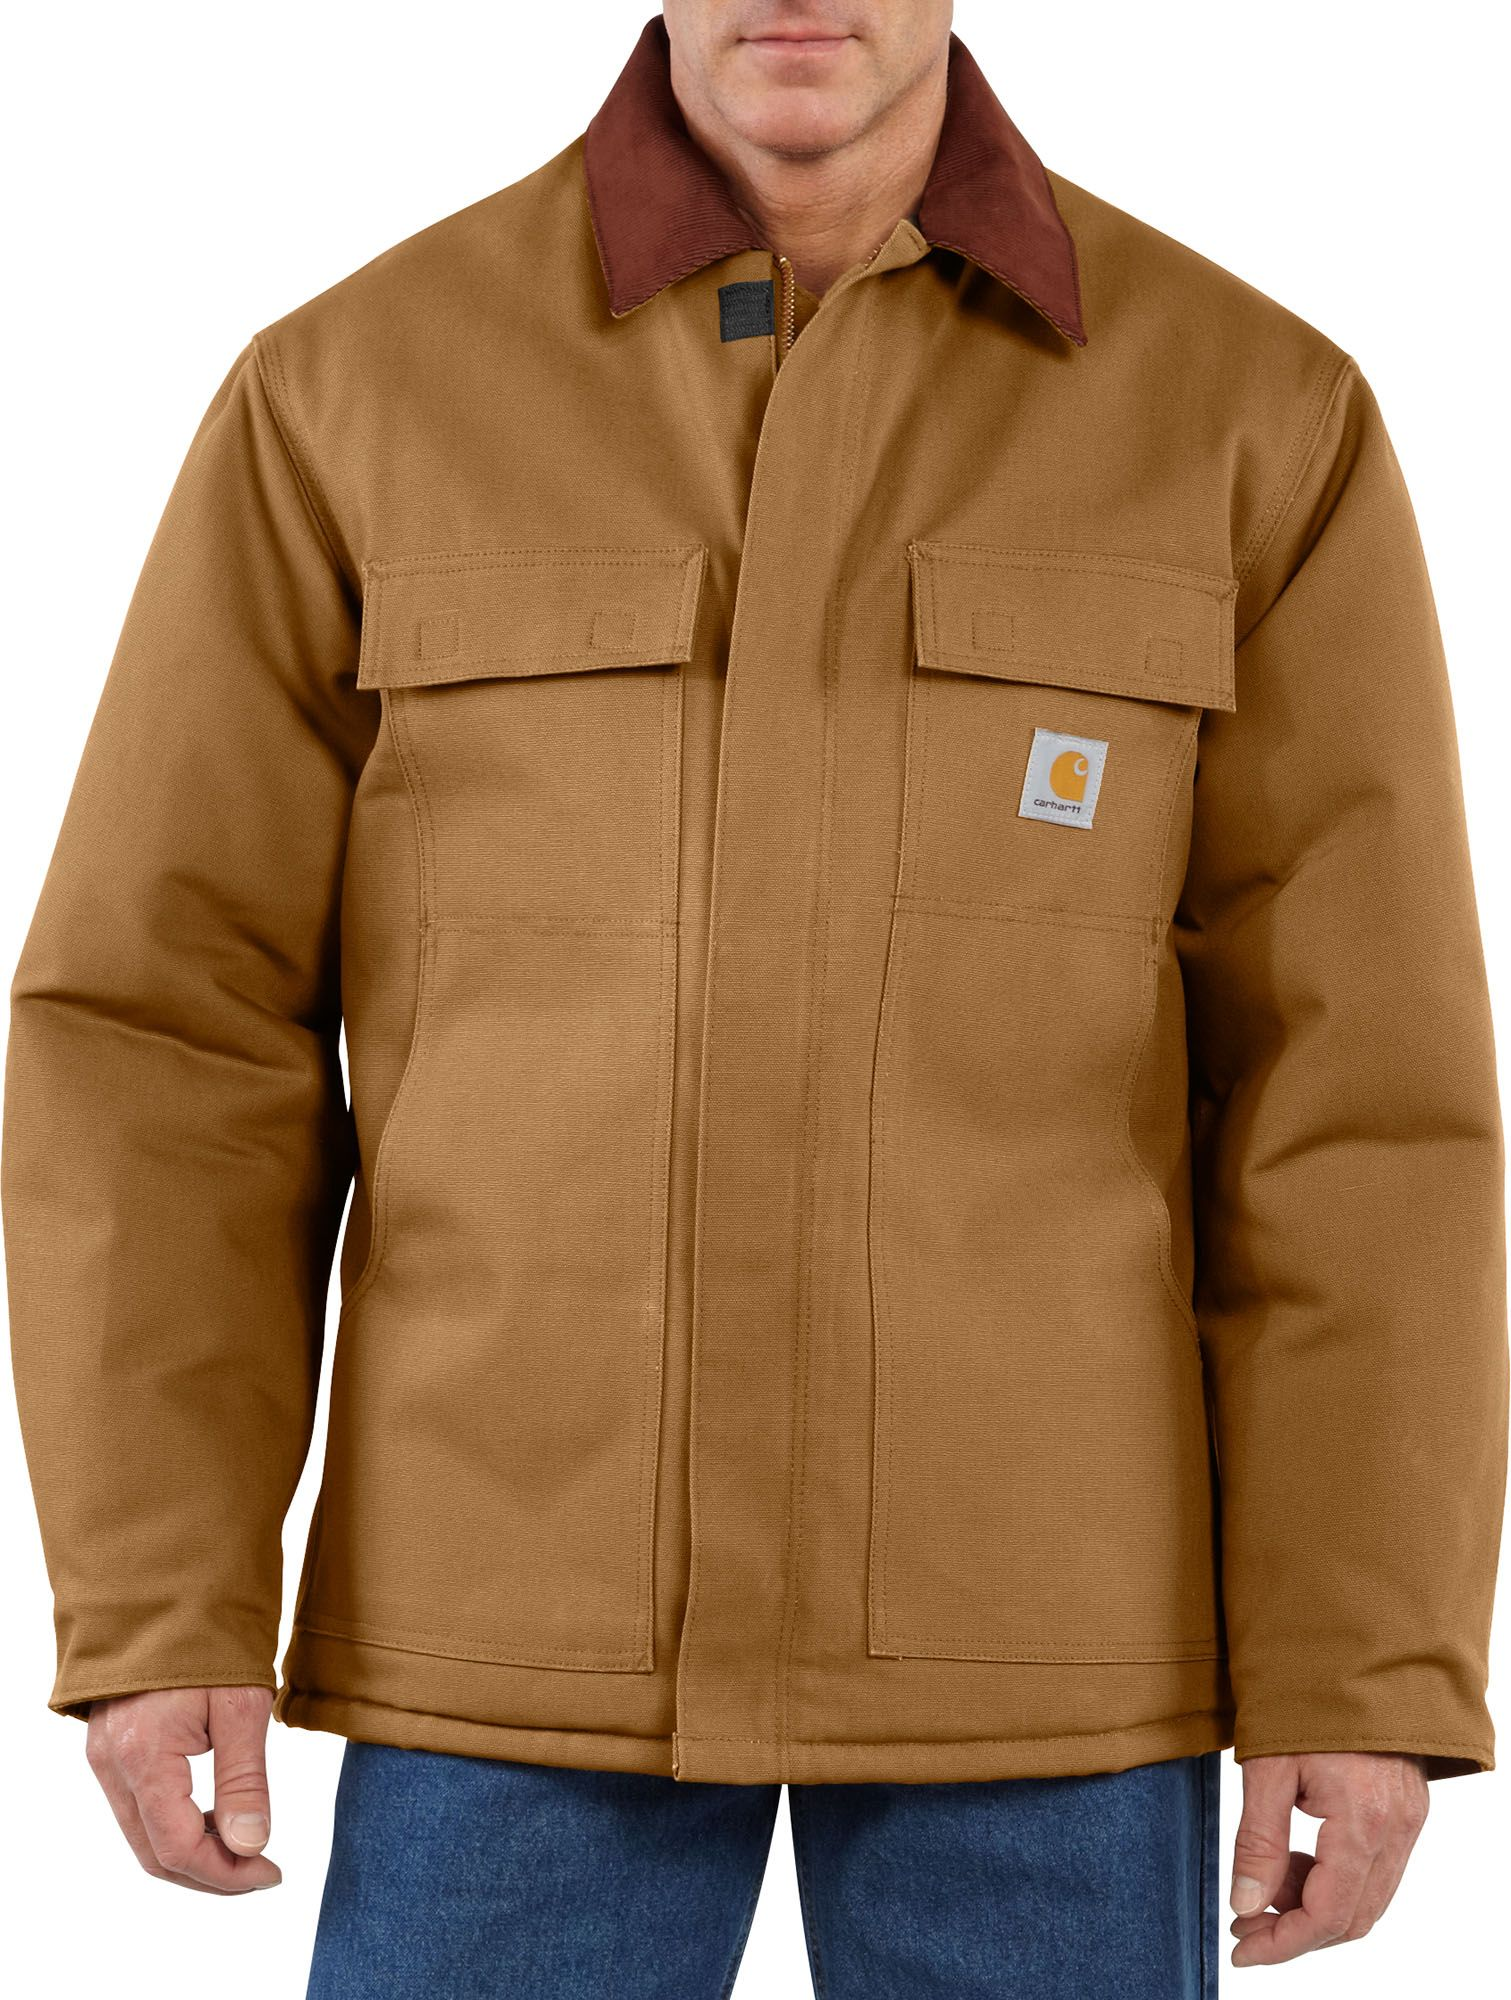 Carhartt Men's Traditional Arctic Quilt-Lined Duck Coat | DICK'S ... : carhartt quilt lined jacket - Adamdwight.com